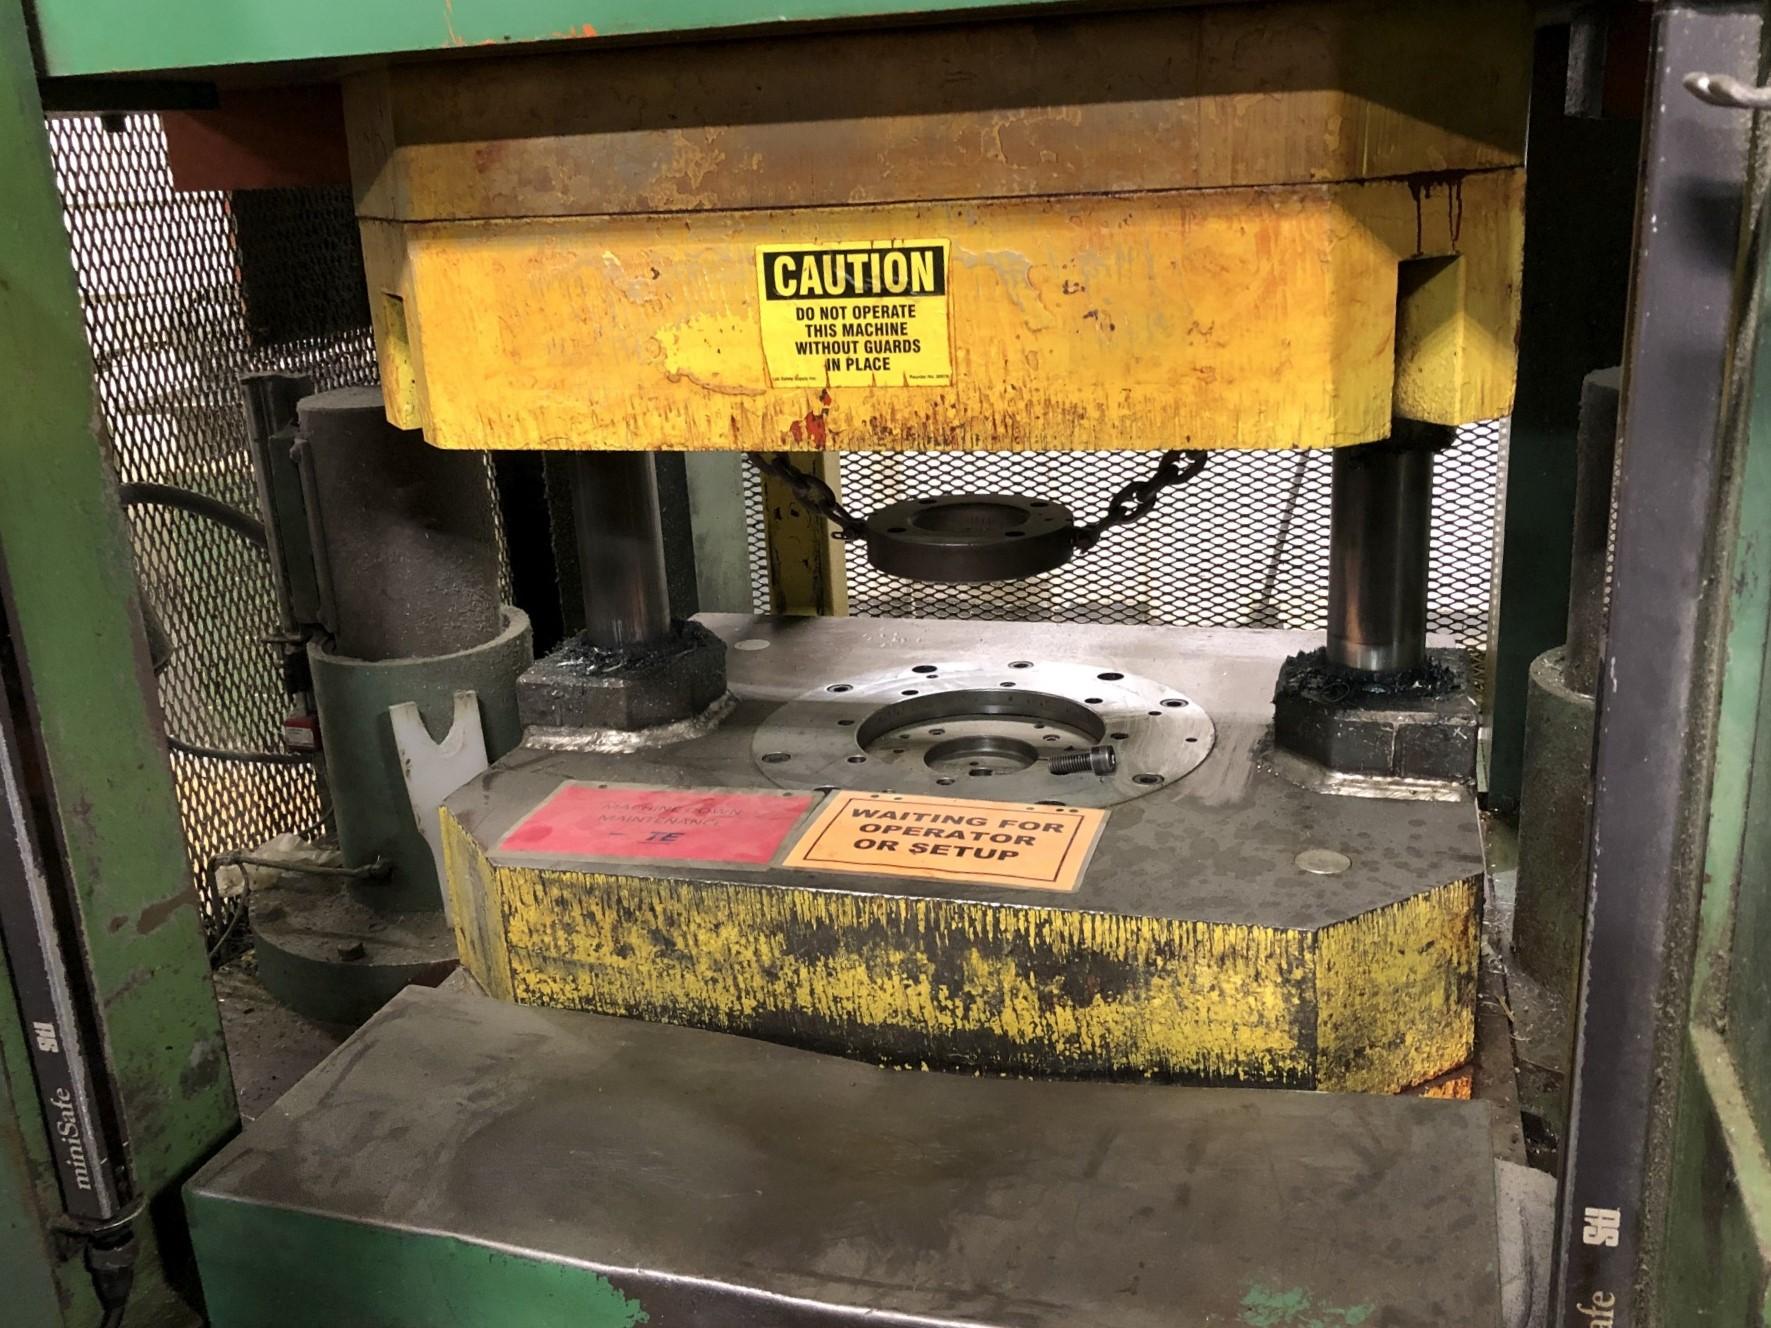 570 Ton Advanced Machine Design Straight Side Press - Image 4 of 15